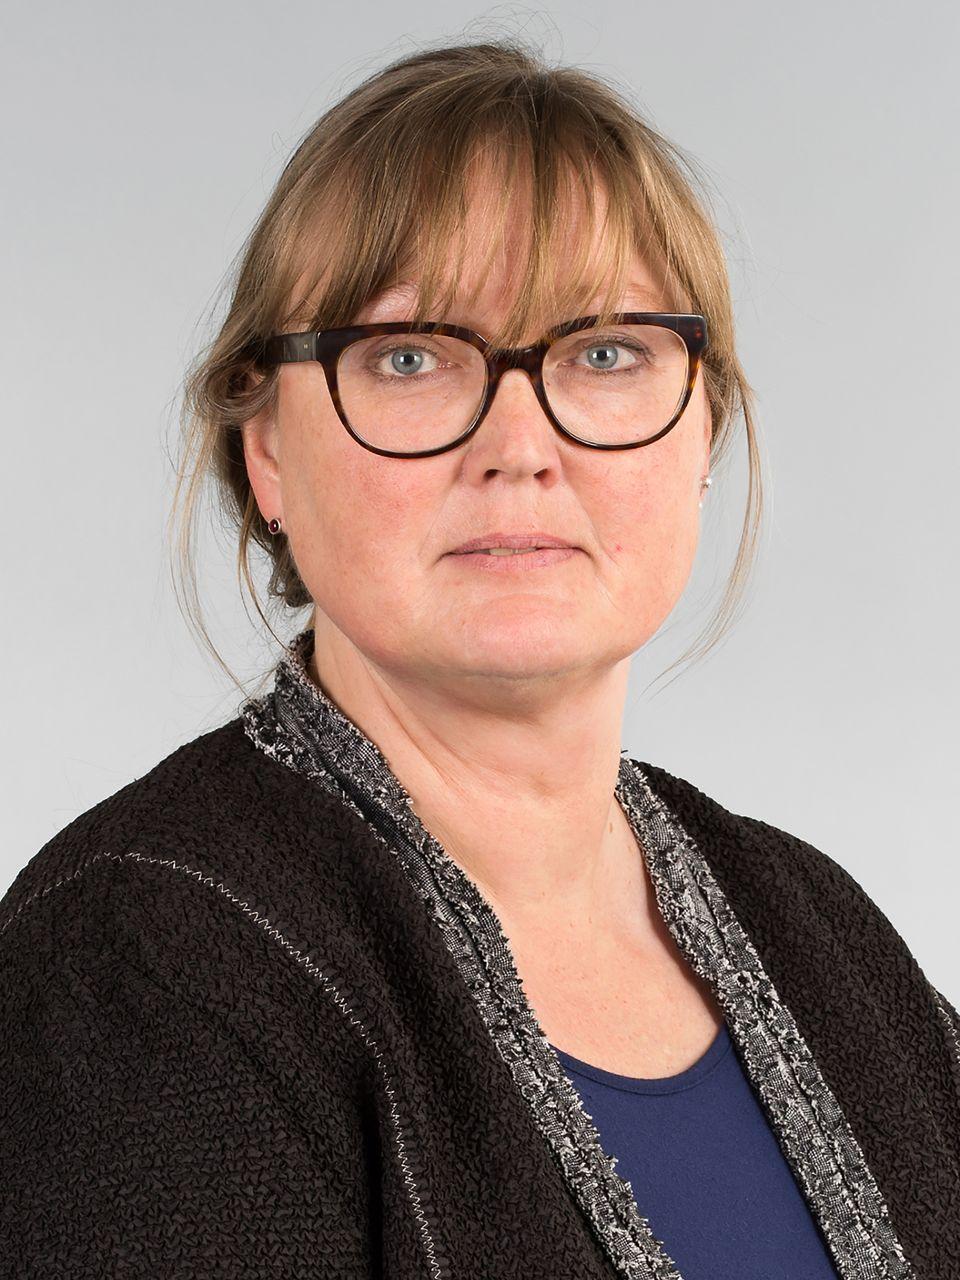 Susann Schulz